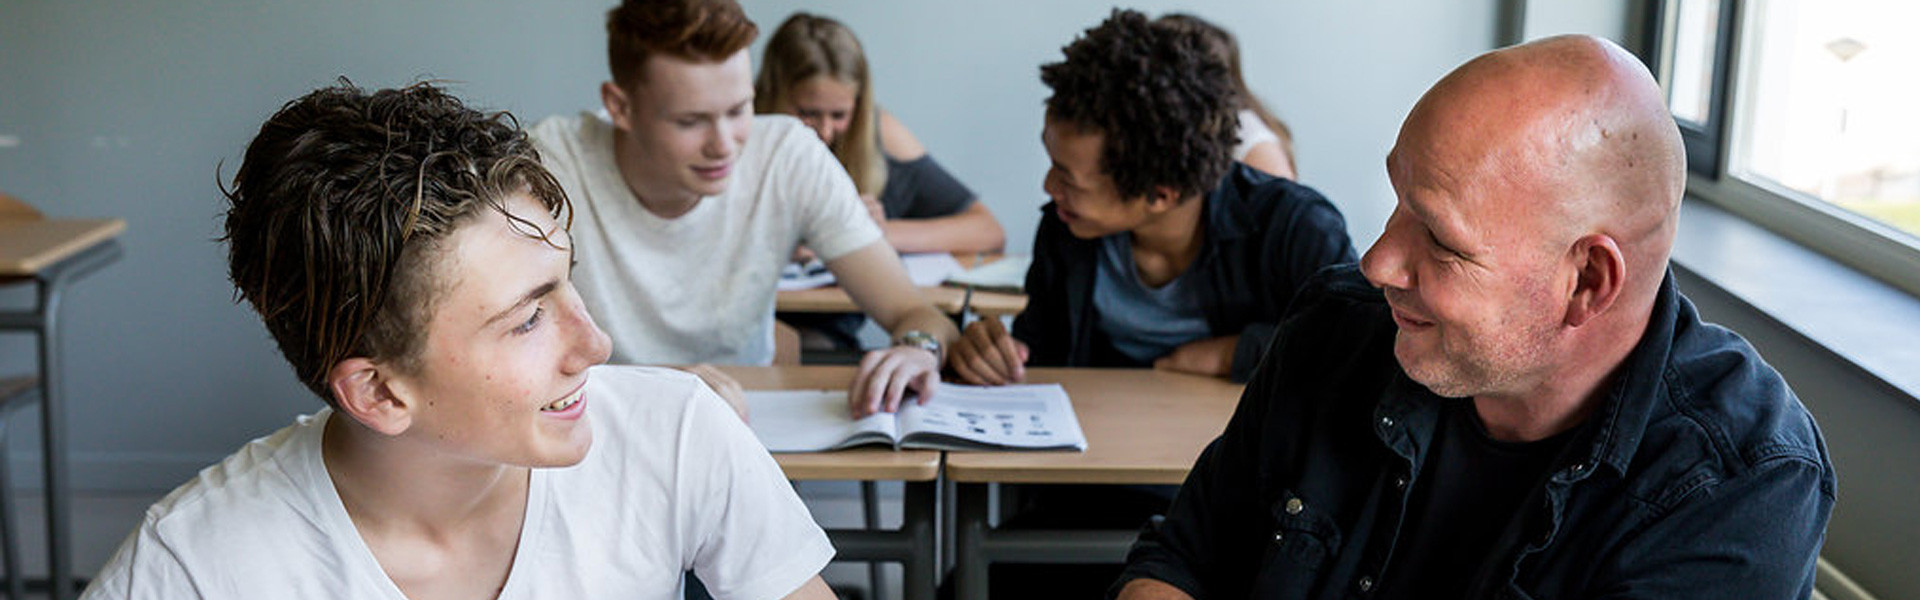 Enthousiaste docent is in gesprek met leerling